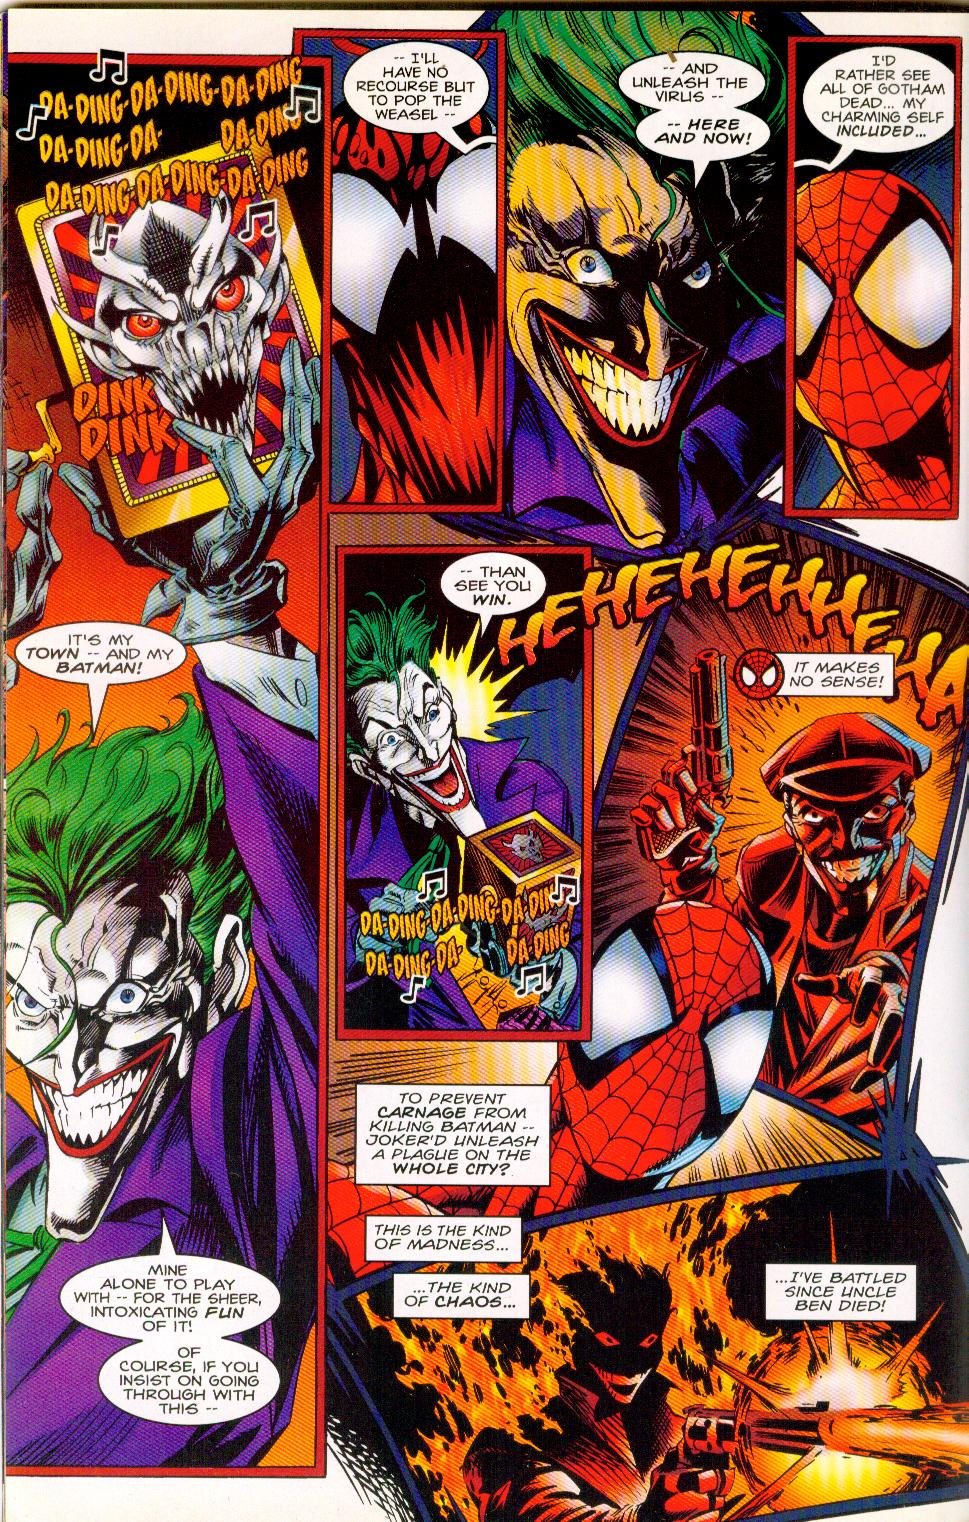 Carnage Vs Joker : carnage, joker, Carnage, Joker, Symbiote, Whowouldwin